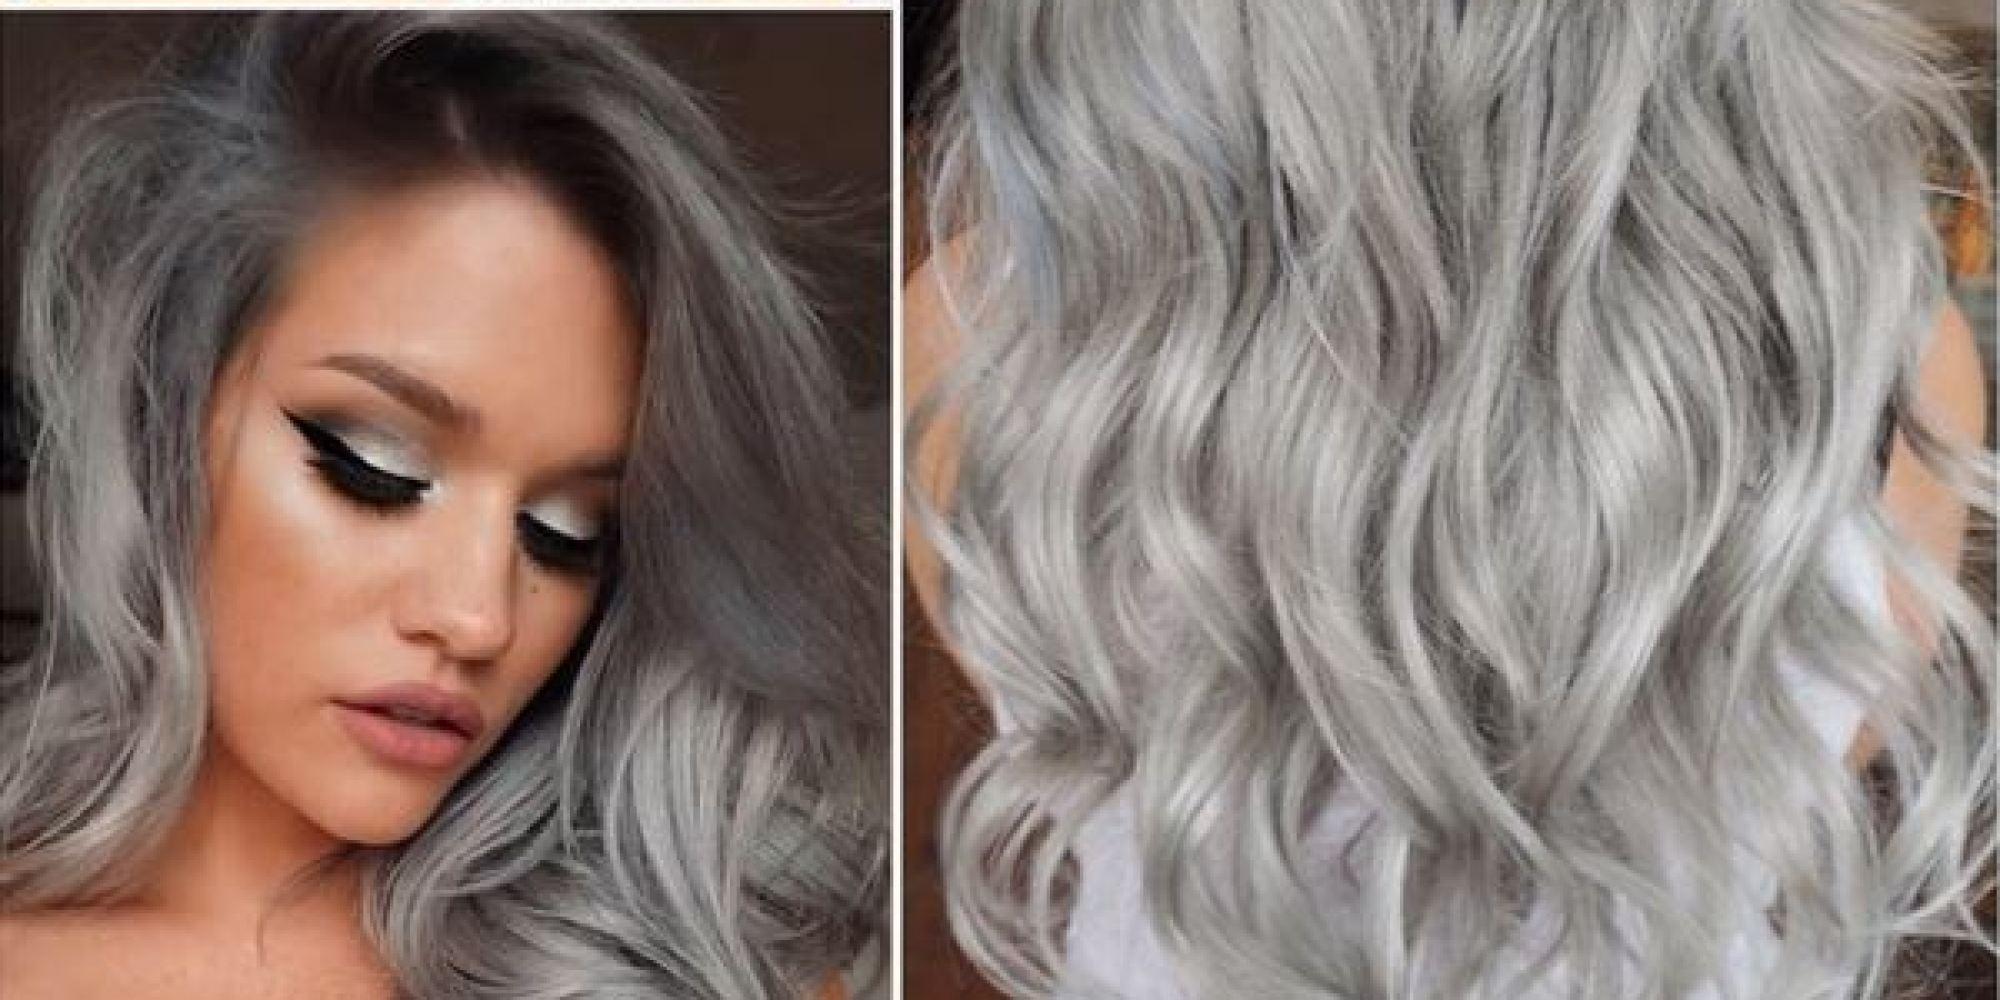 Granny Hair Trend 22 Photos Proving Grey Is Glamorous